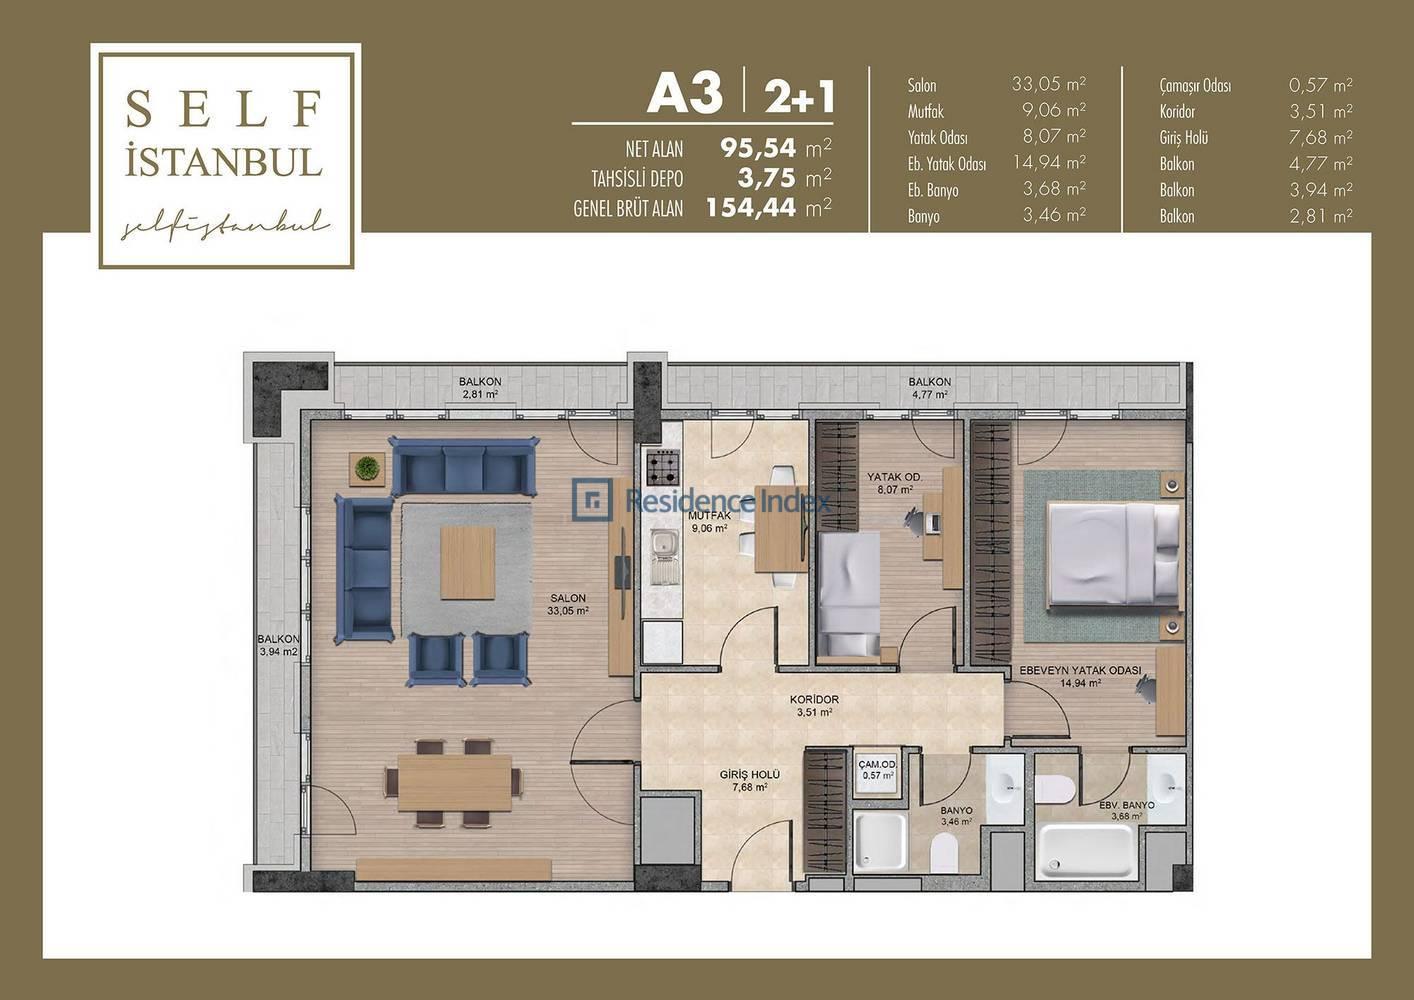 Self İstanbul  A3